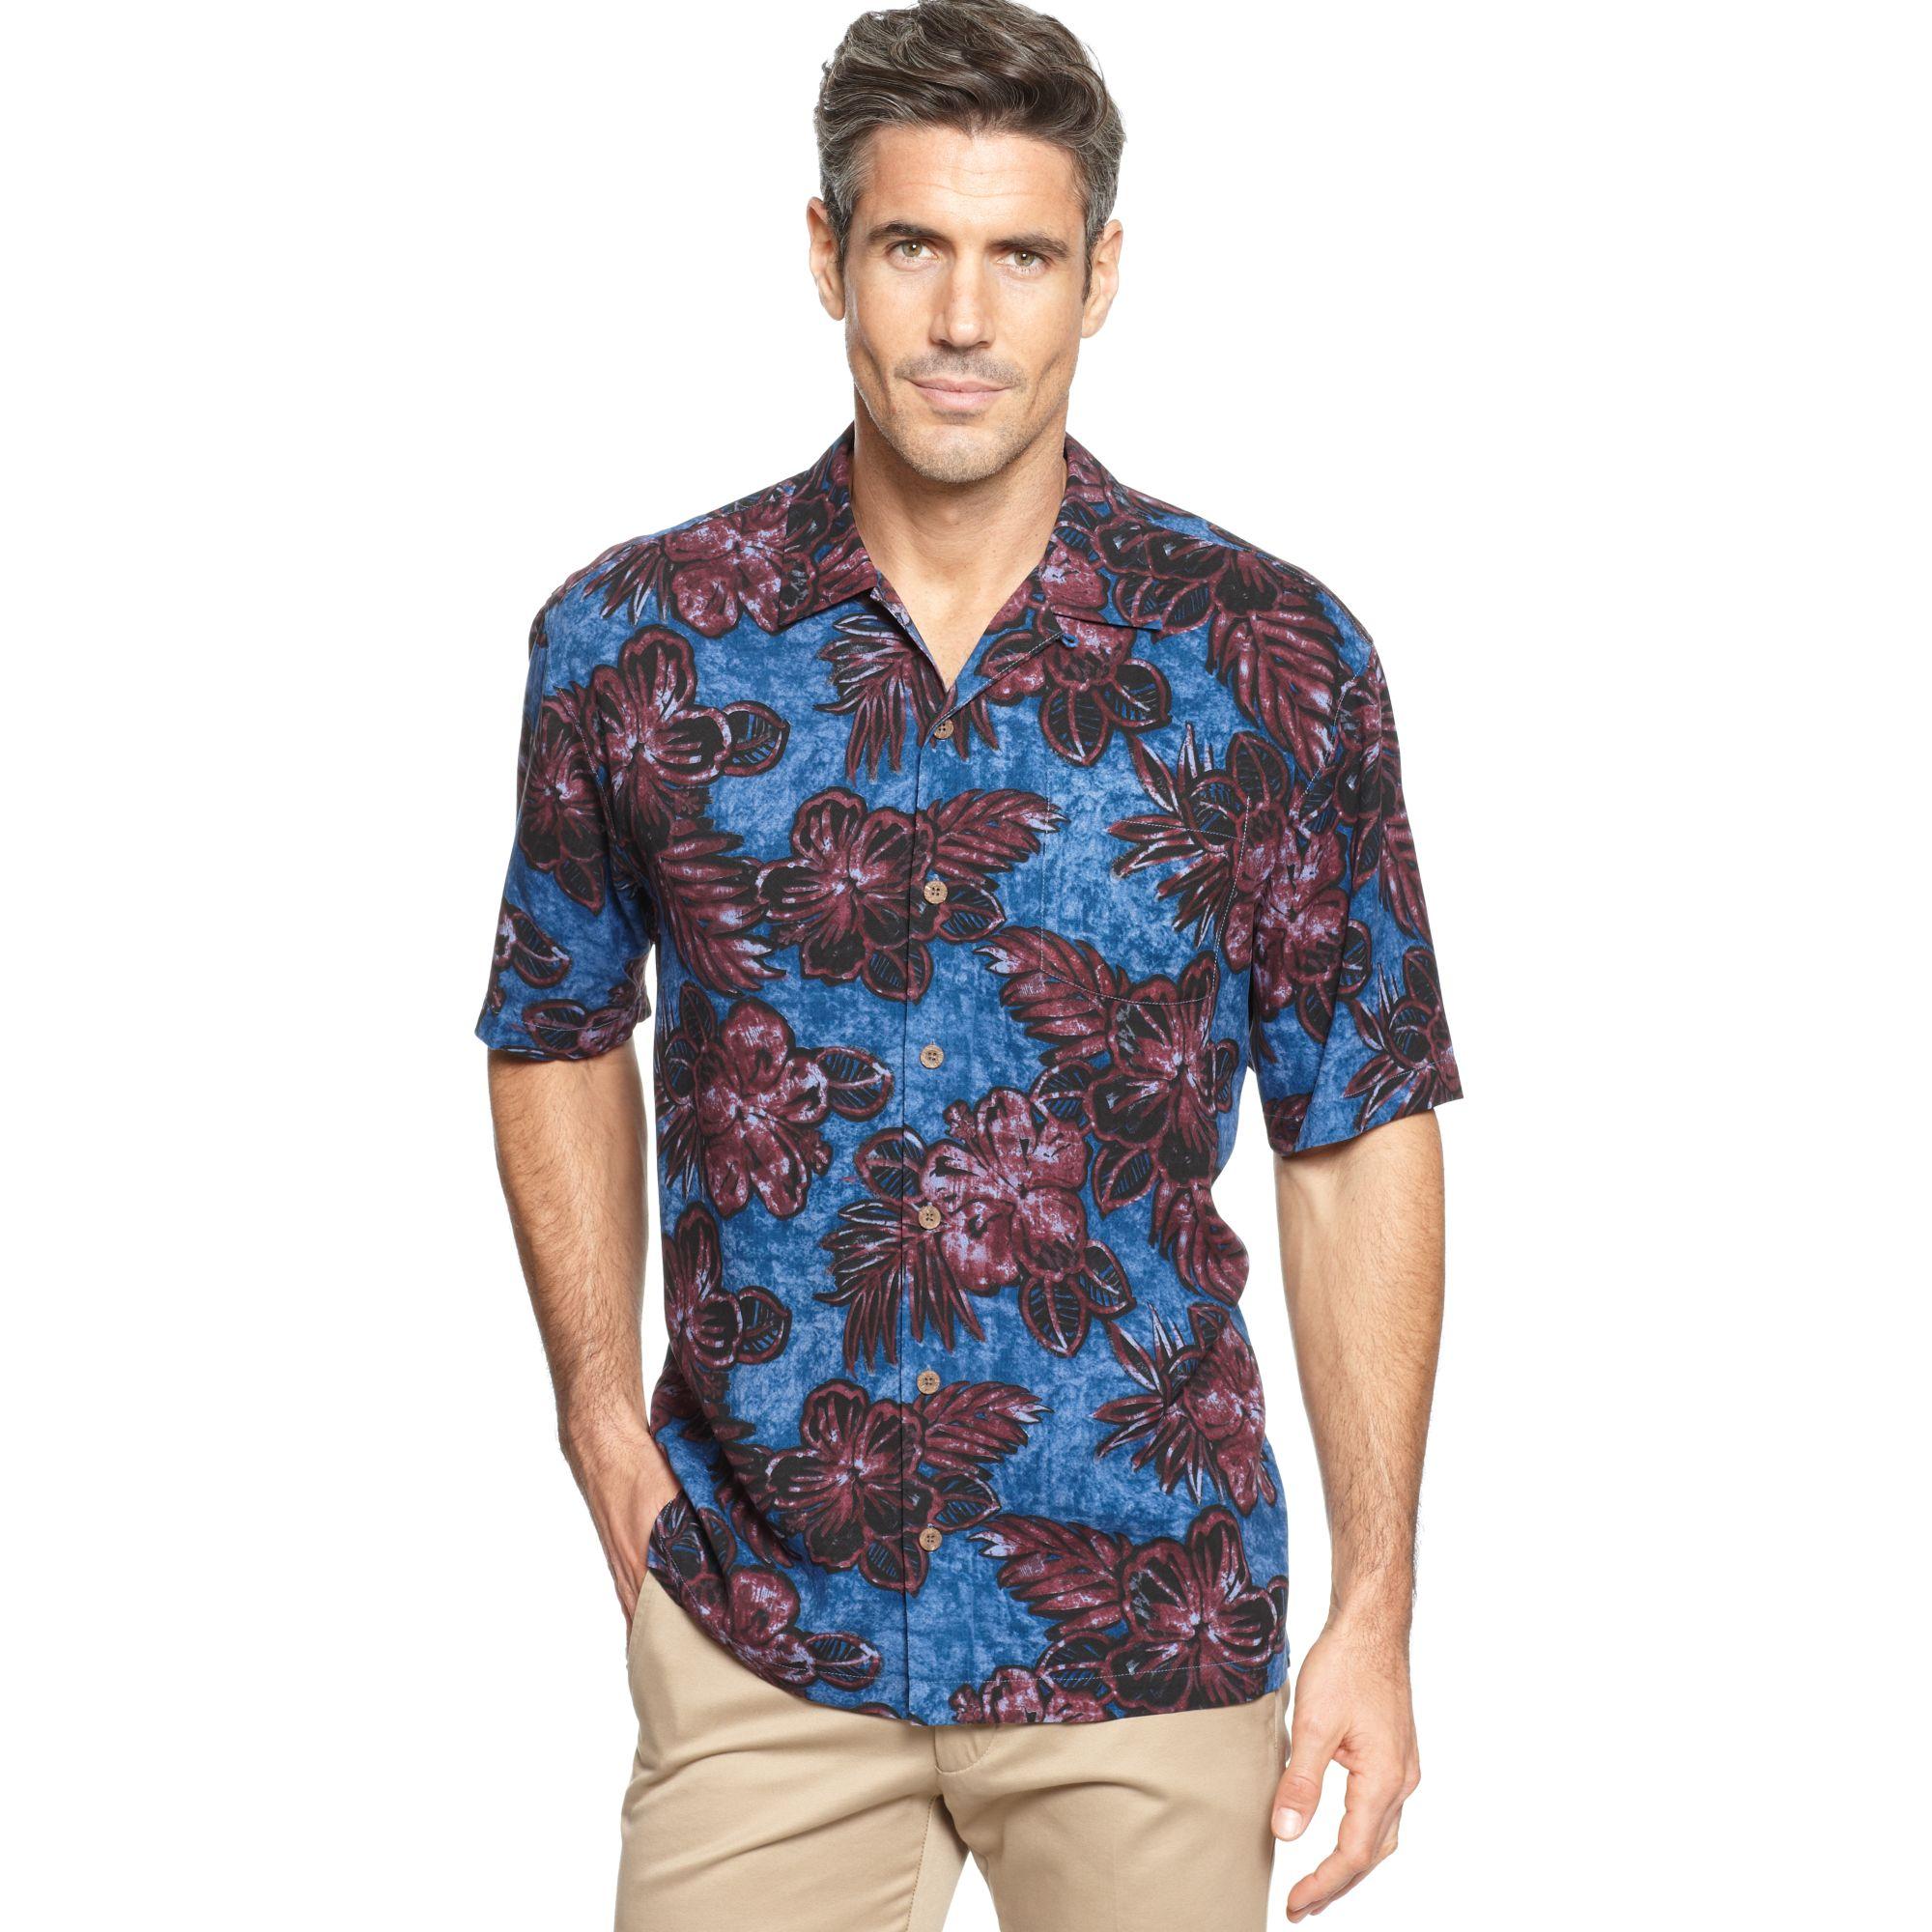 Tommy Bahama Barcelona Batik Short Sleeve Shirt In